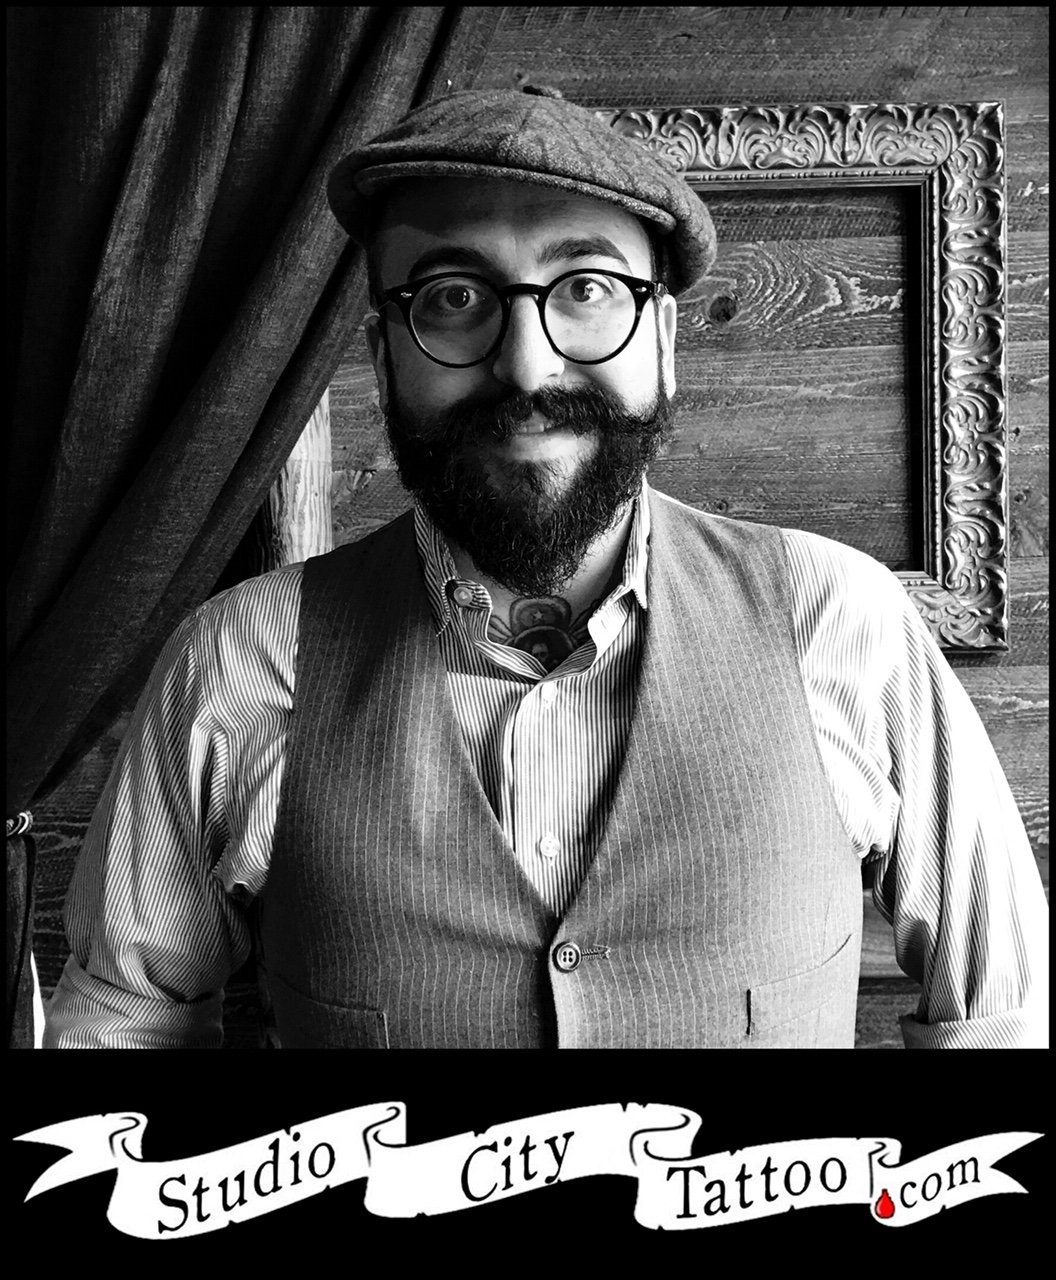 jose-menendez-tattoo-artist-studio-city-tattoo